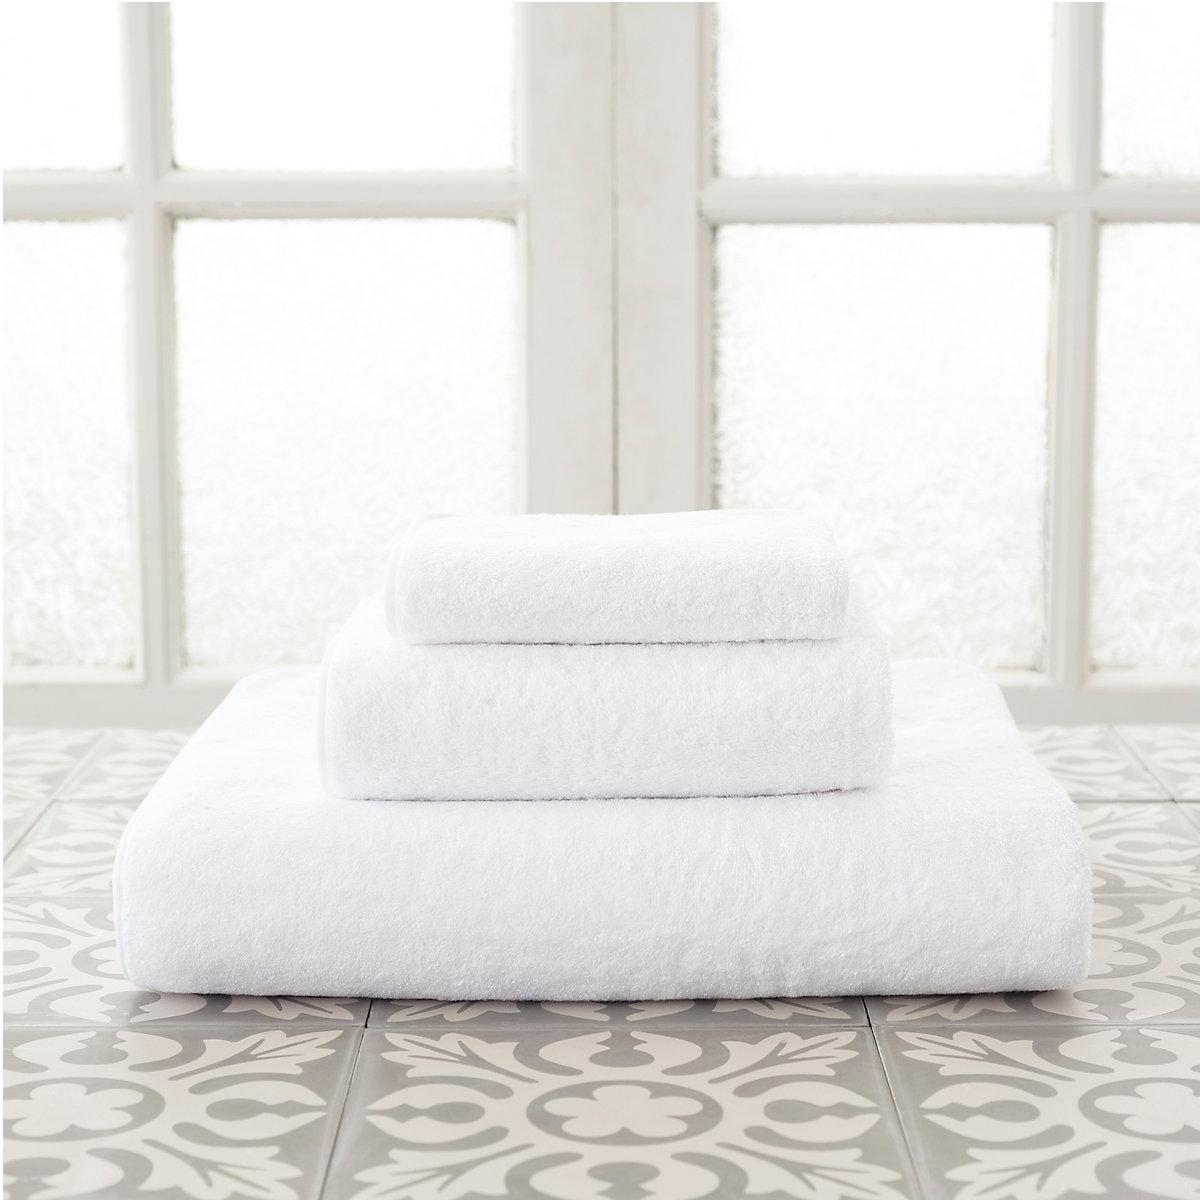 Primo White Towel | Luxe